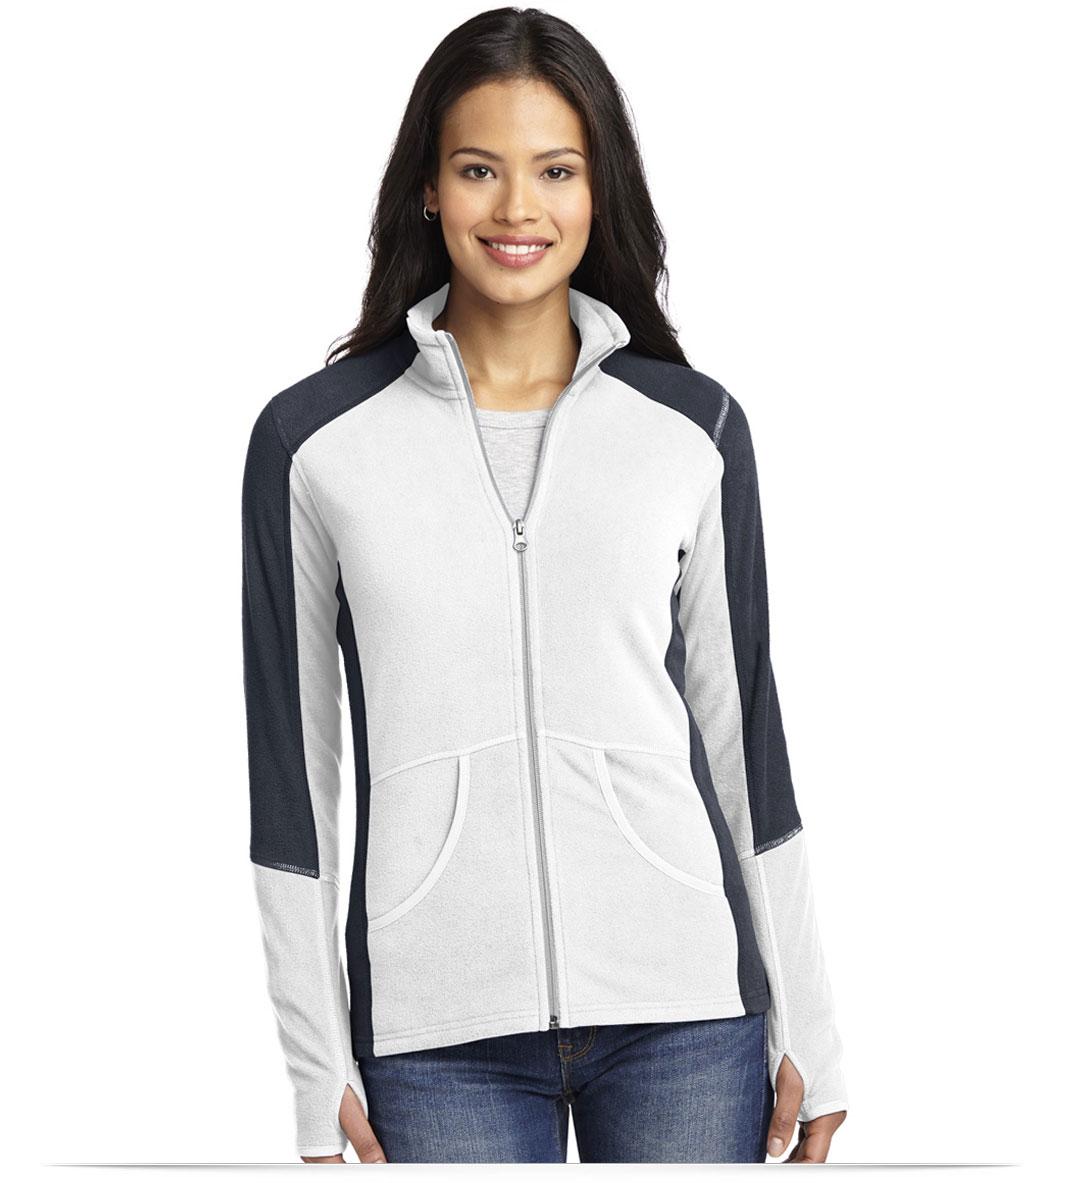 Customize Port Authority Ladies Colorblock Microfleece Jacket